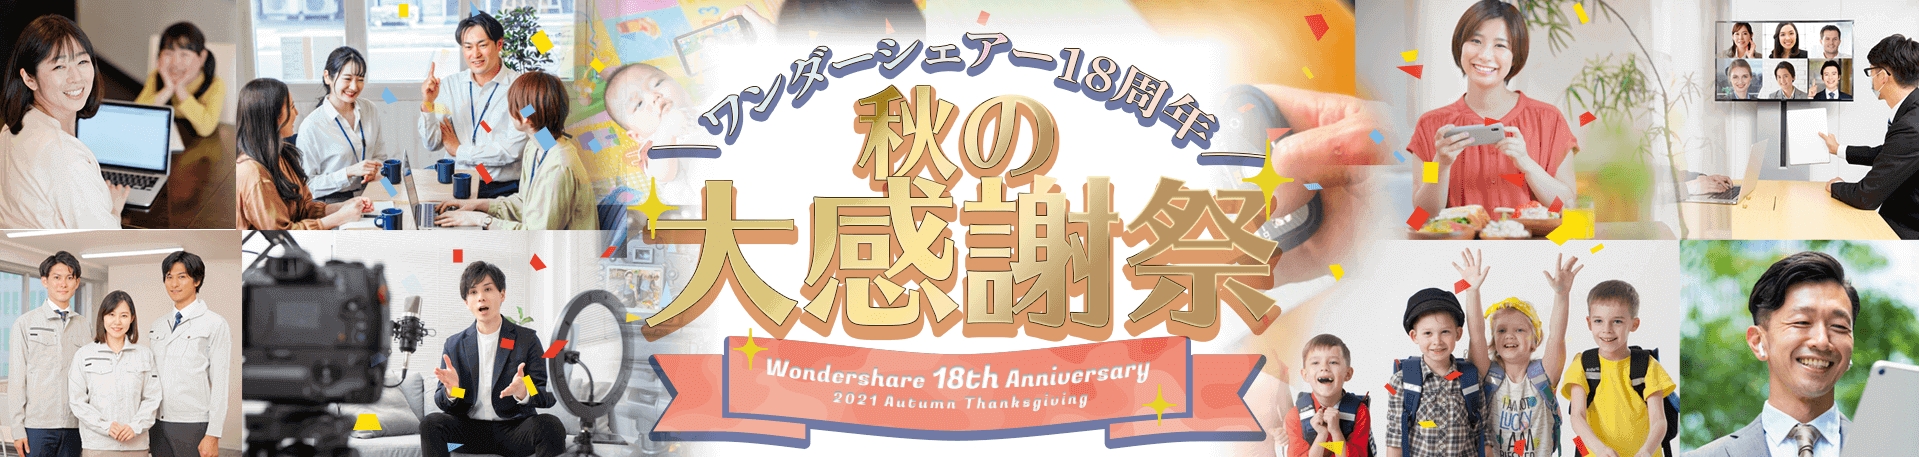 Wondershare秋の大感謝祭